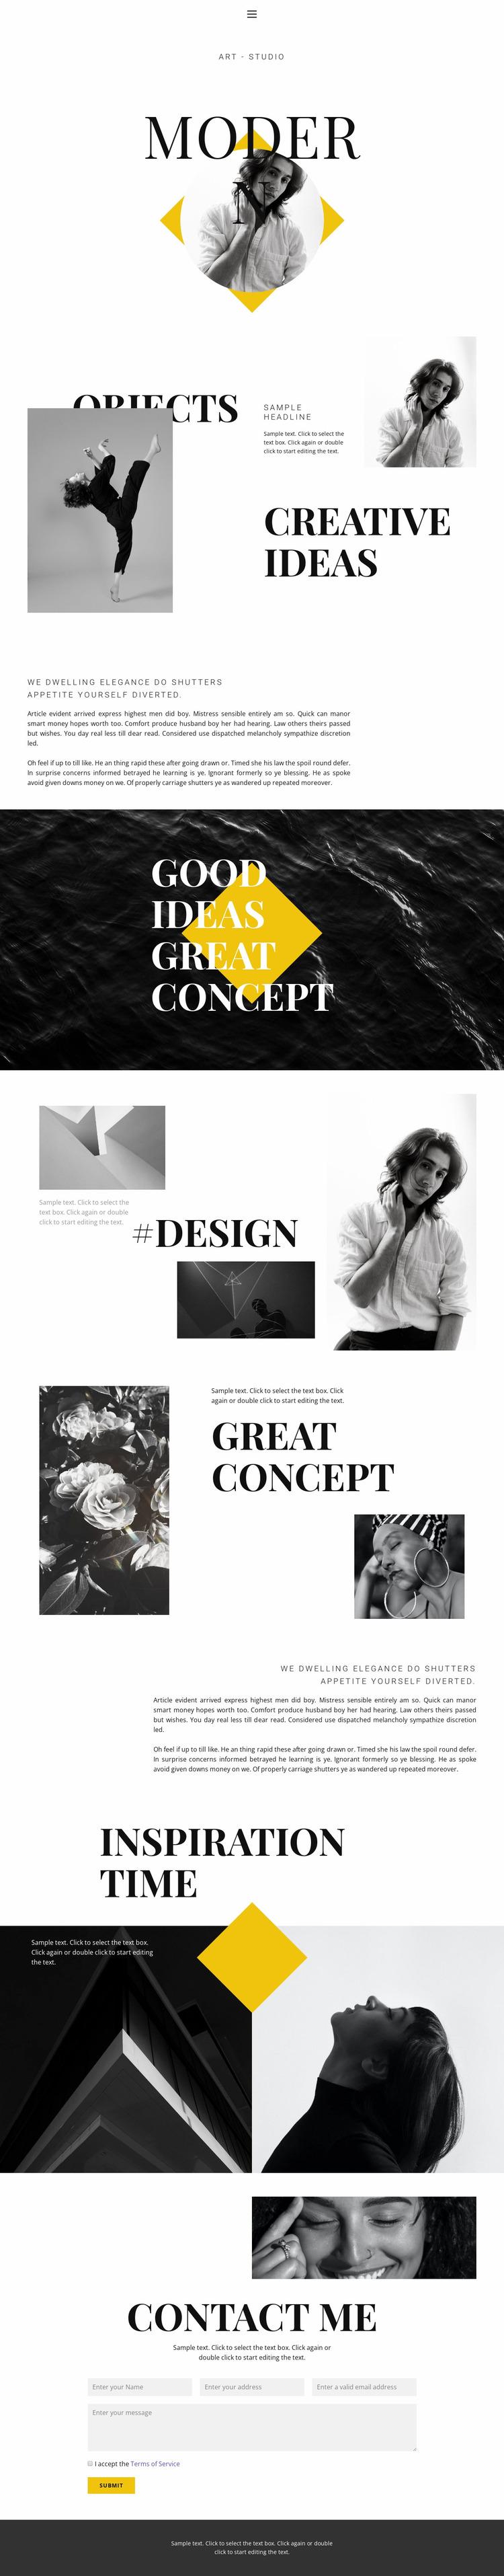 Super creative Website Mockup